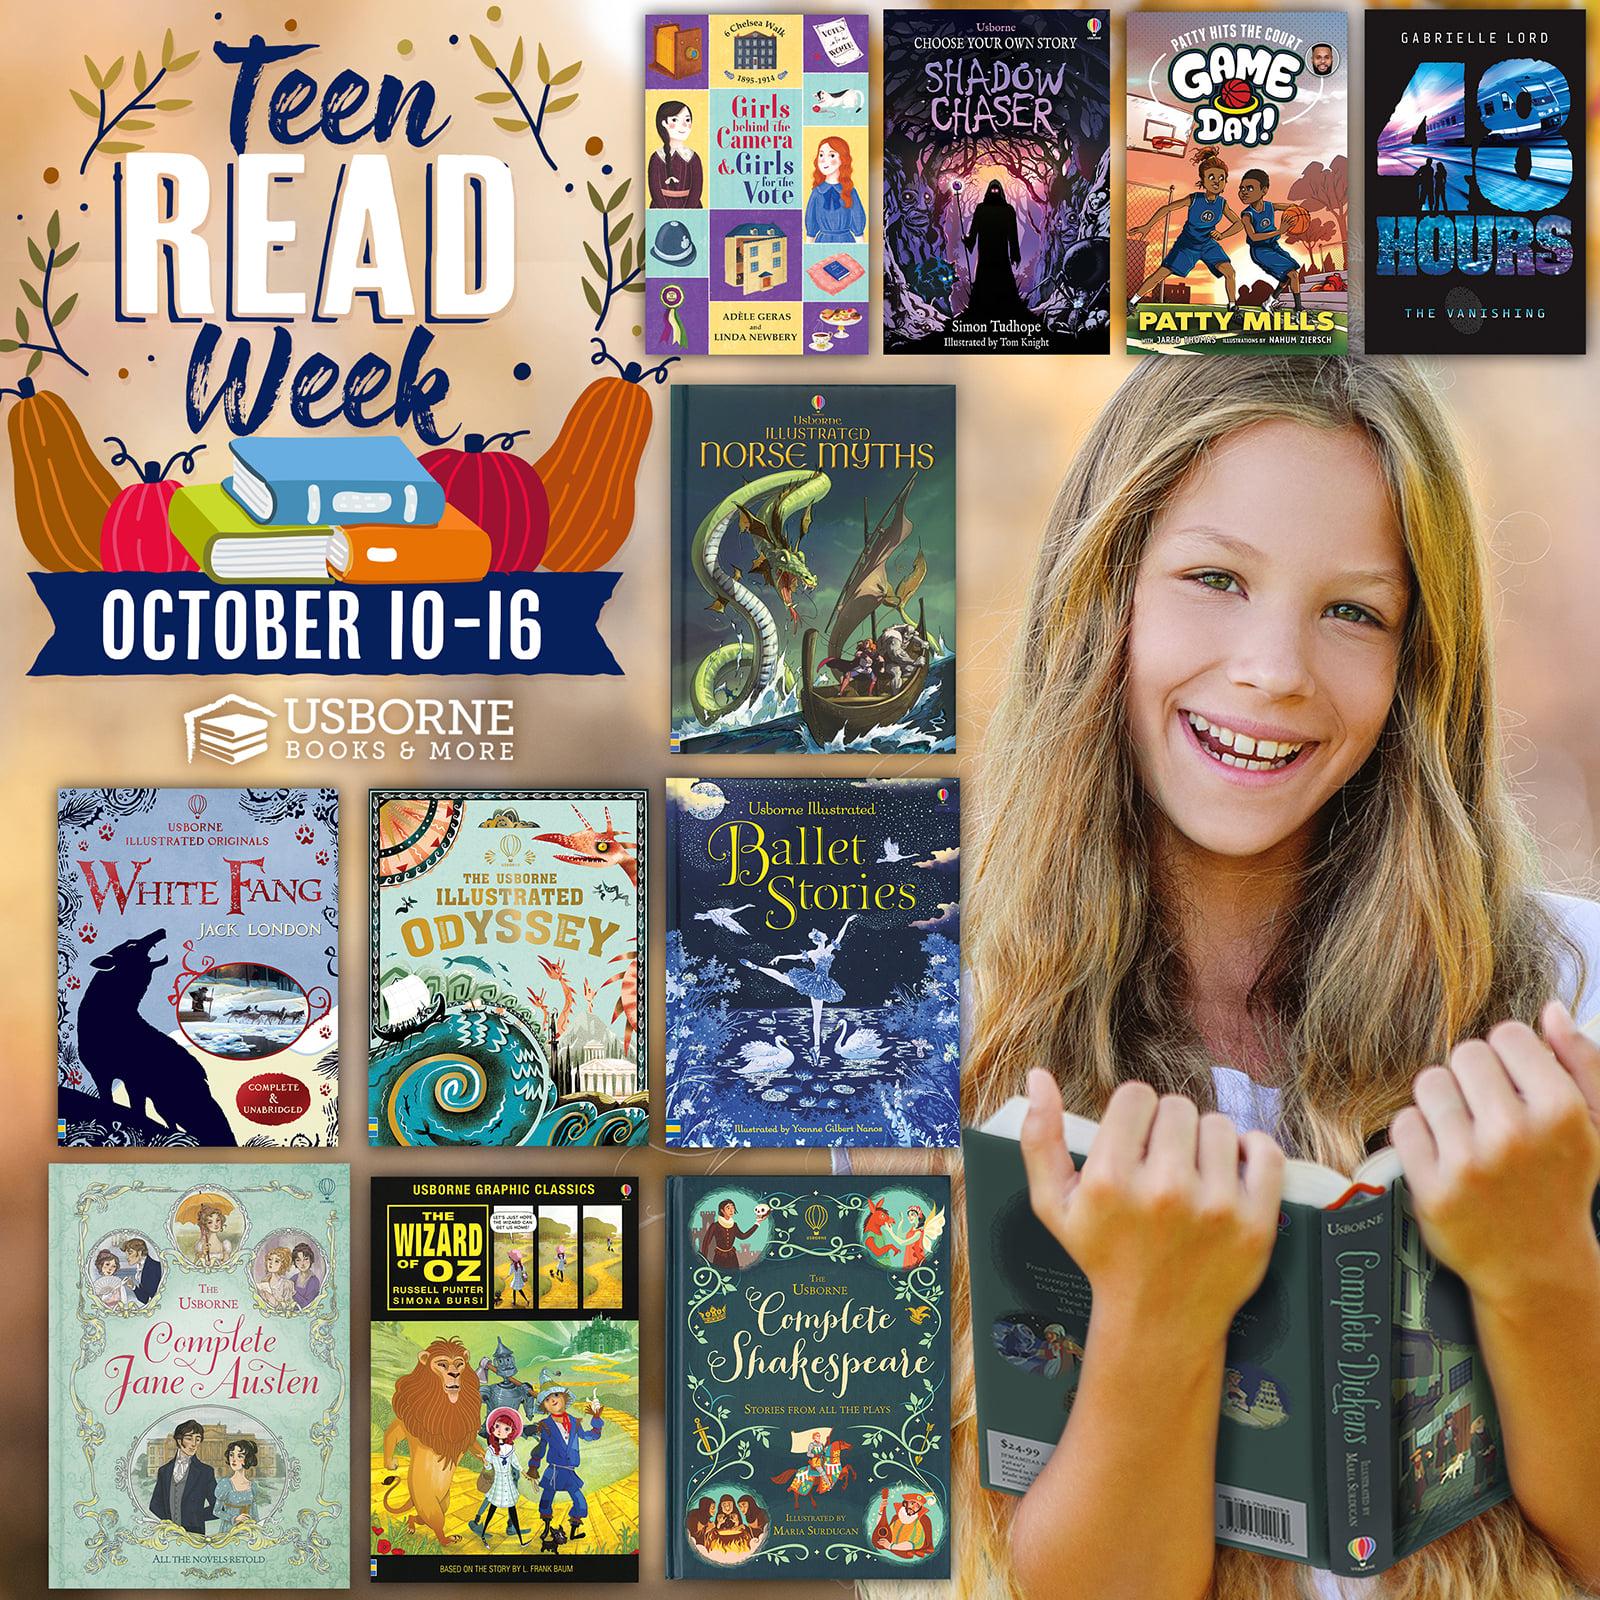 Teen Read Week ~ October 10-16